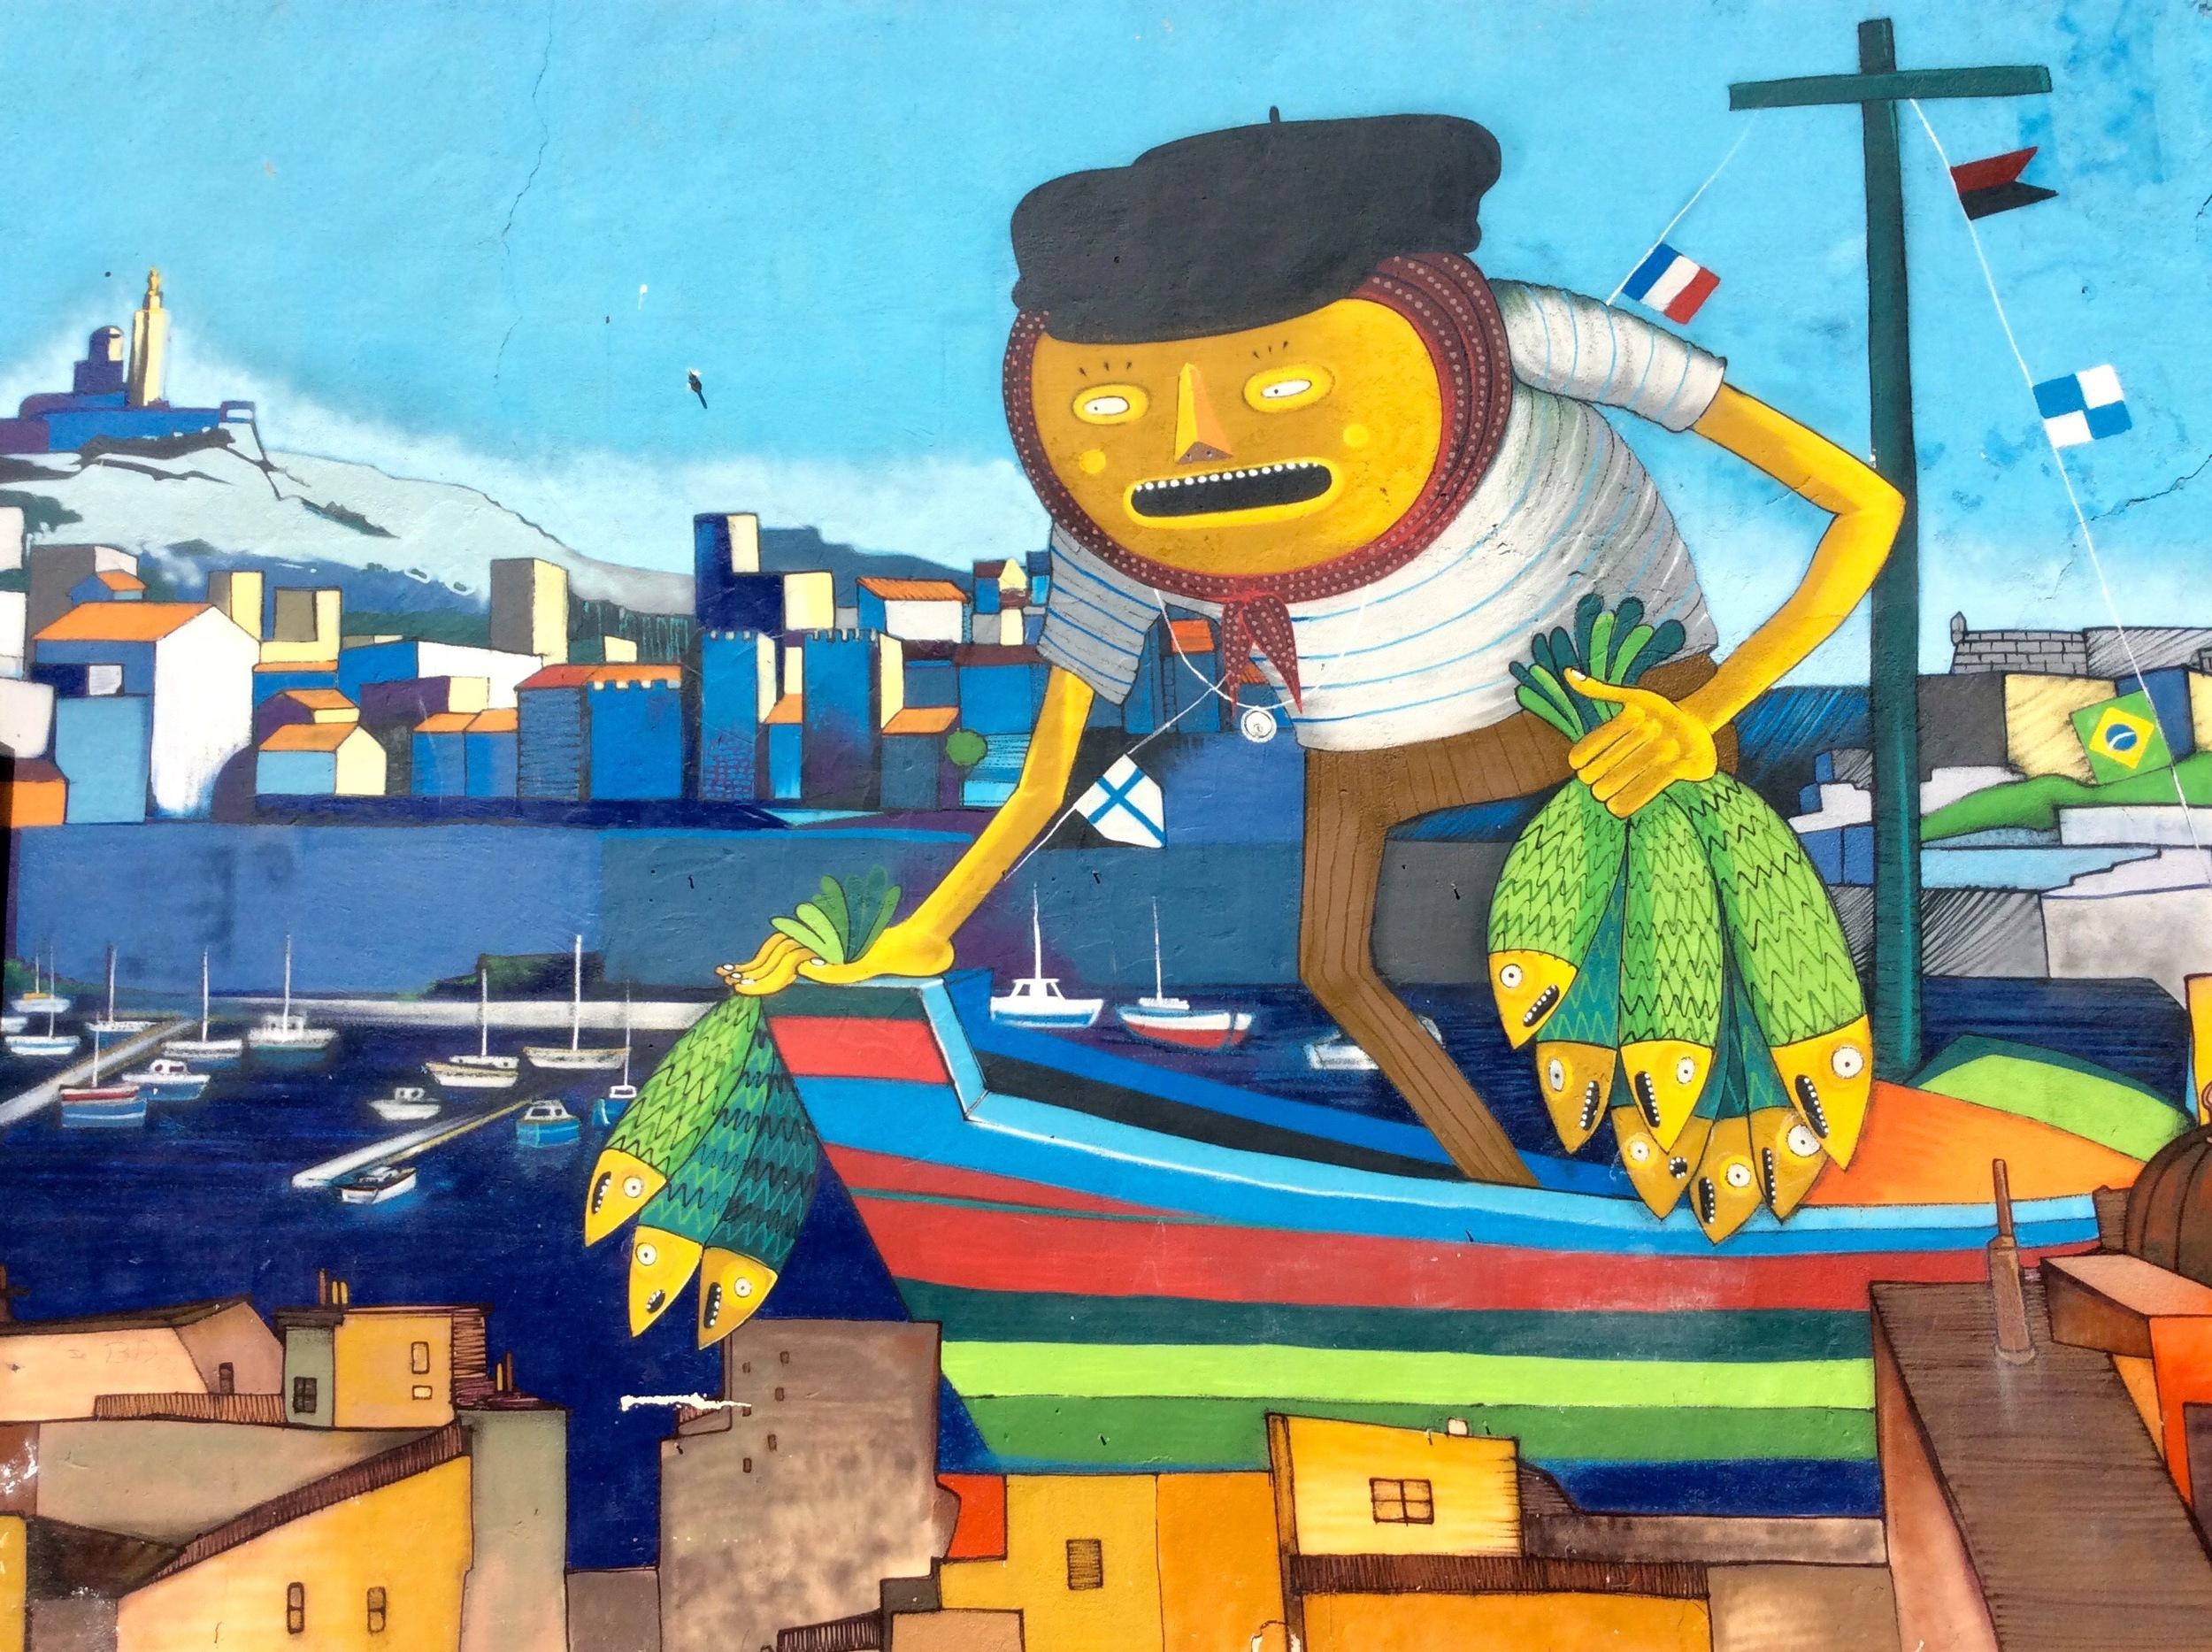 Here's some random Marseille street art for you